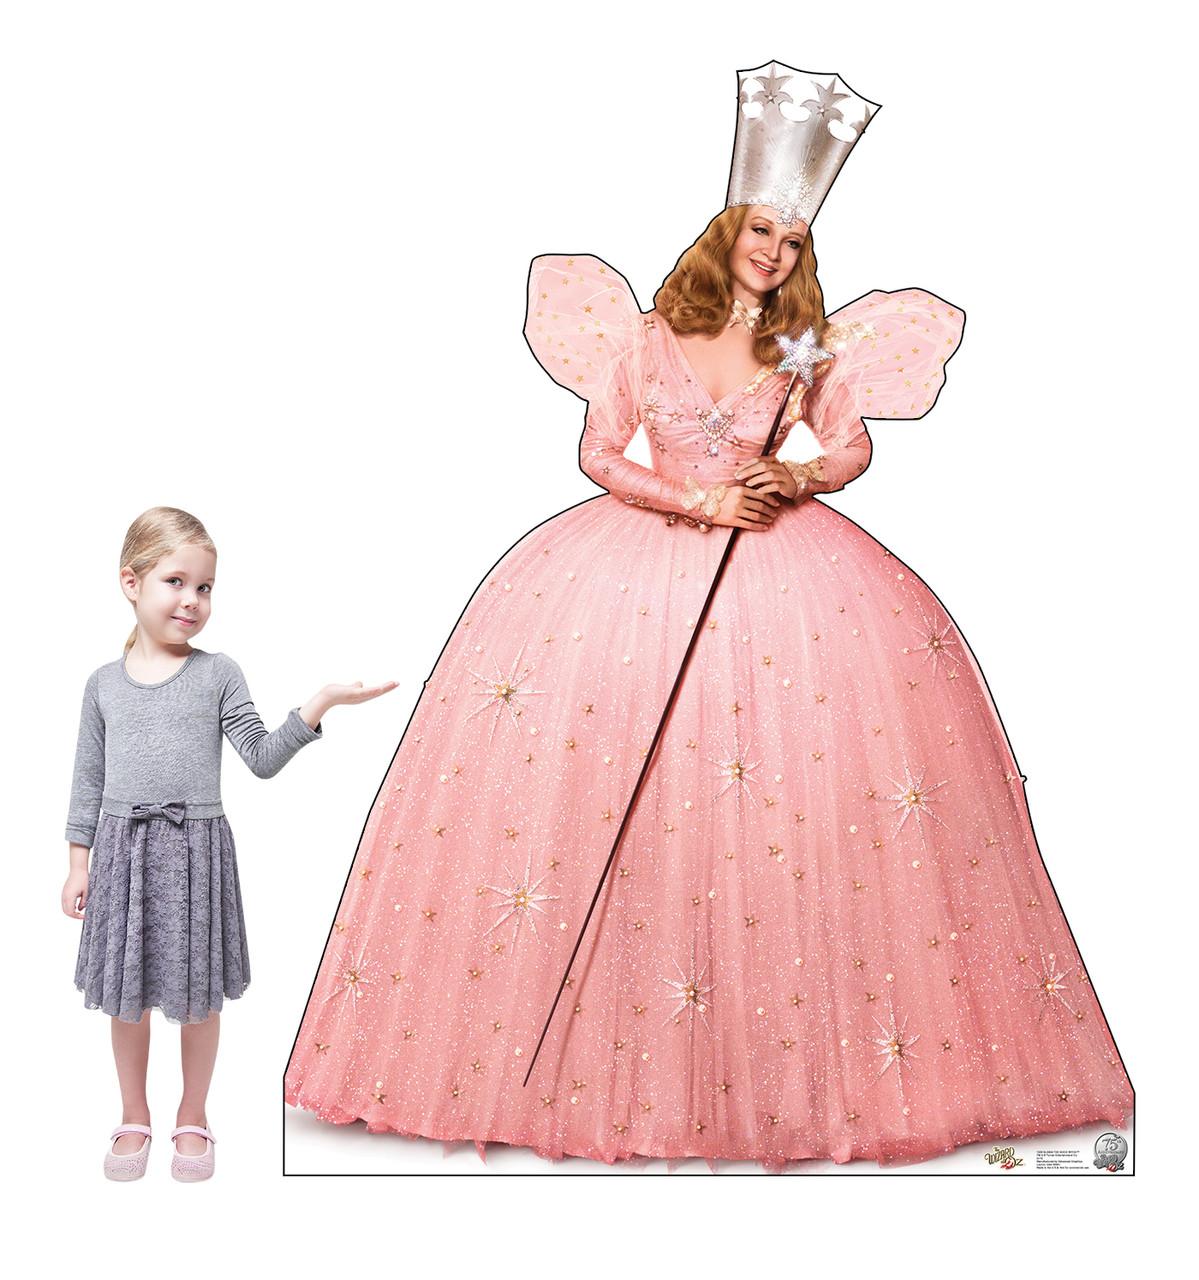 Glinda the Good Witch - Wizard of Oz